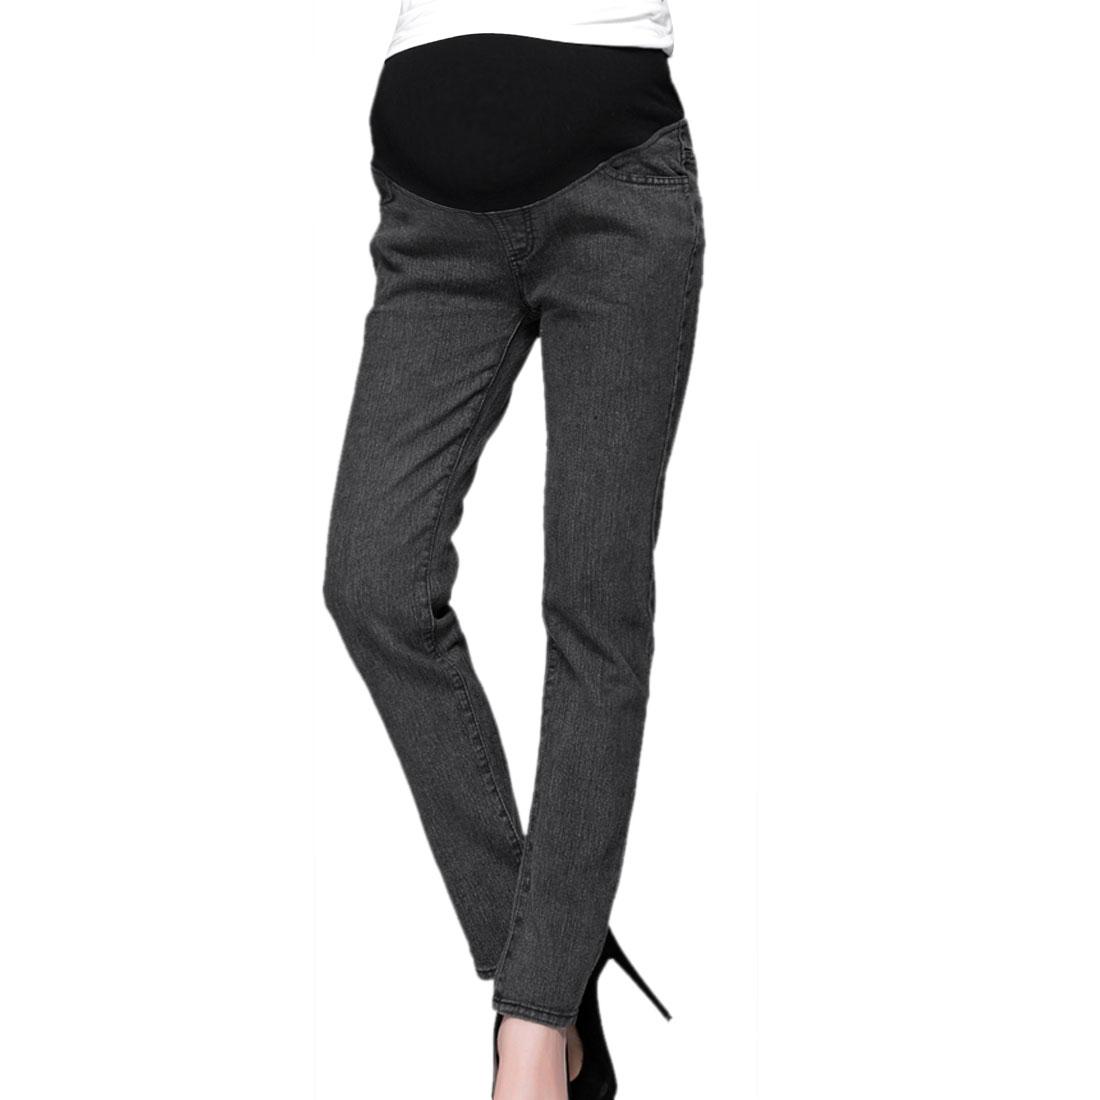 Maternity Stretchy Waist Panel Hip Pockets Pants Dark Gray S